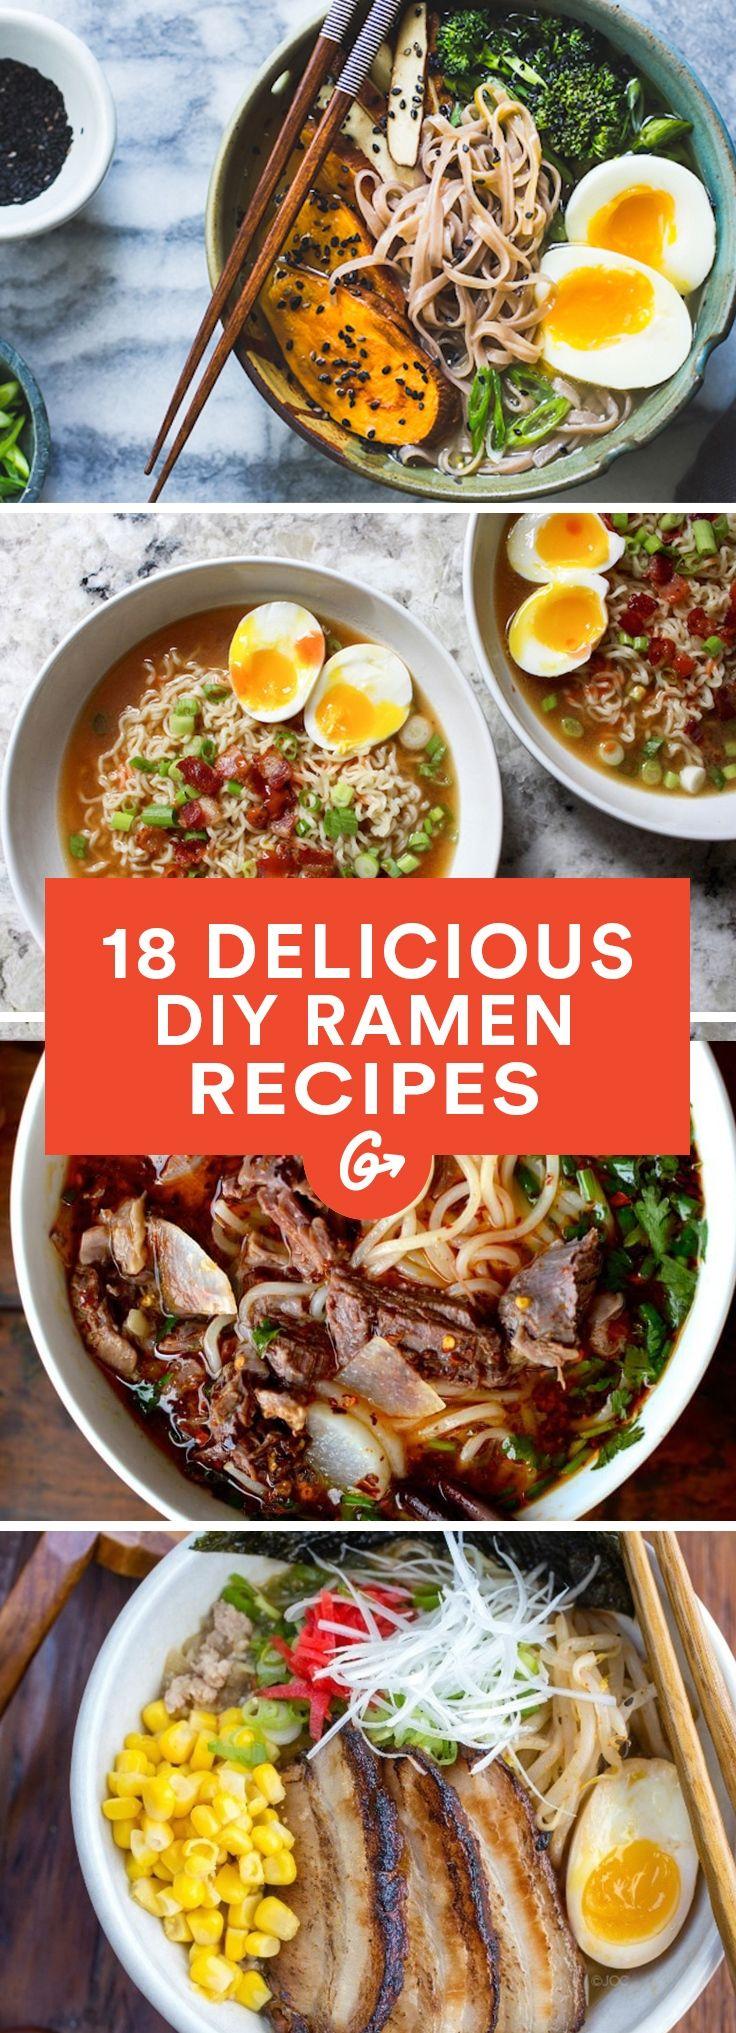 17 DIY Ramen Recipes That'll Make You Forget About Instant Noodles #healthy #recipes #ramen http://greatist.com/eat/healthier-ramen-recipes #weightlosstips